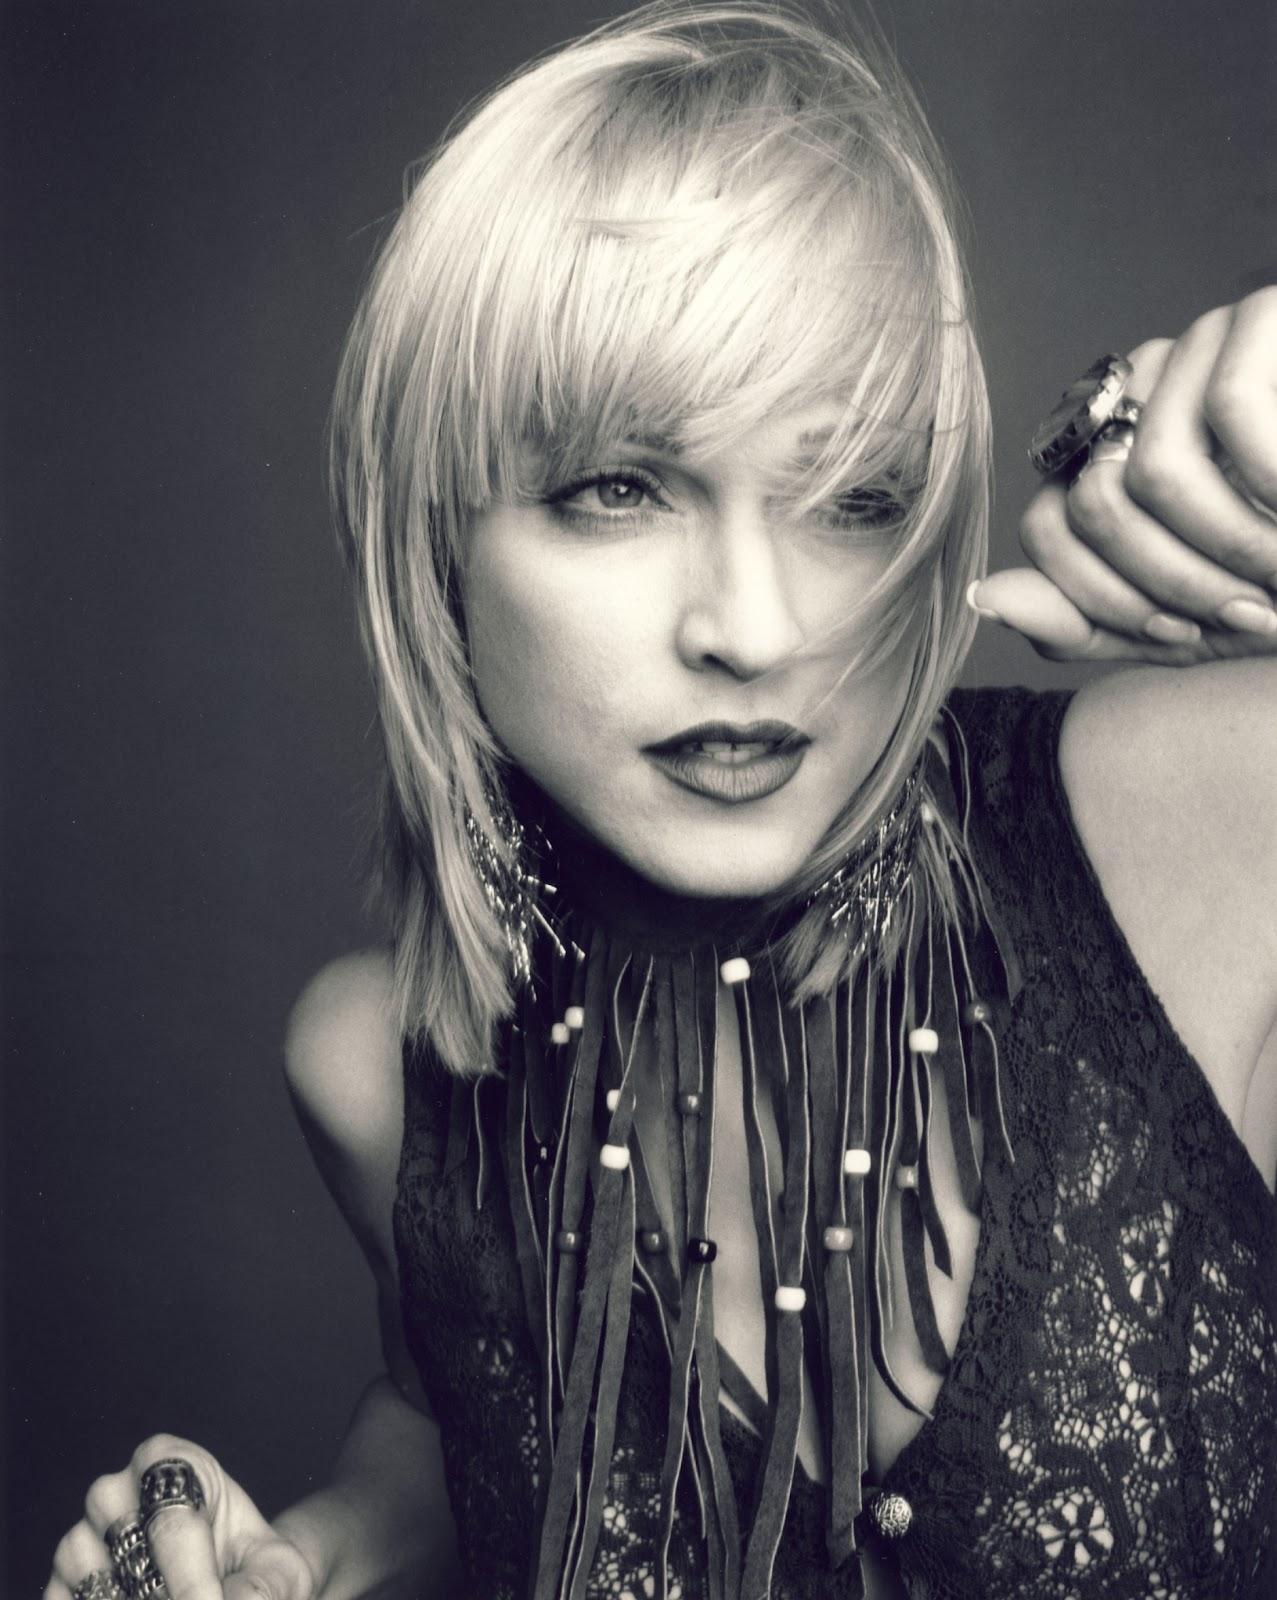 http://3.bp.blogspot.com/-us_K42LKtEU/T1XMLfbUmRI/AAAAAAAABVE/-hzWDe8Pjtw/s1600/Madonna-Looking-Cool-and-Effortless-As-Always.jpg